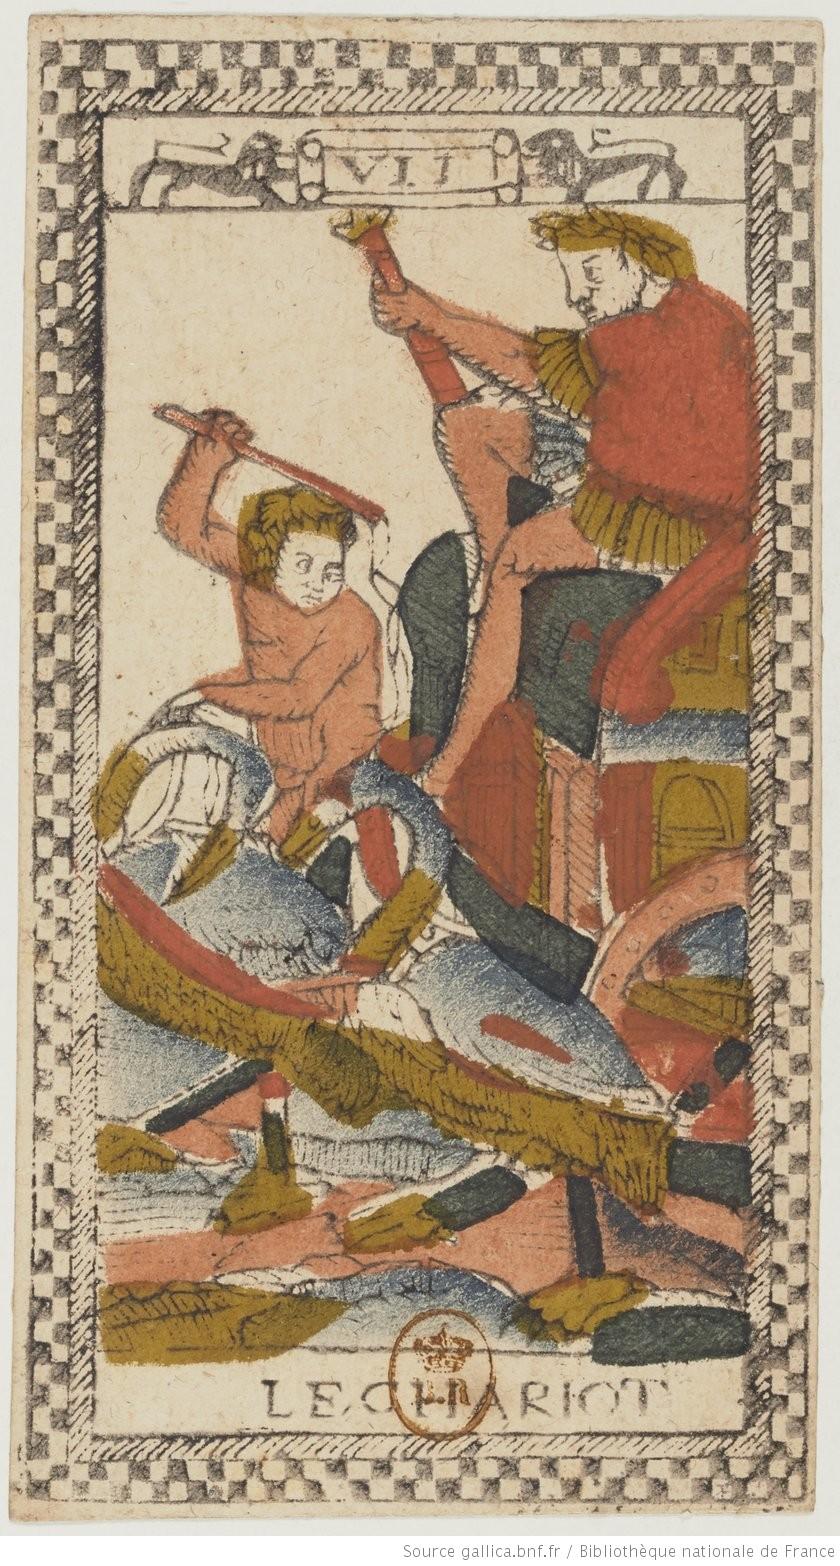 http://gallica.bnf.fr/ark:/12148/btv1b105109624/f13.highres